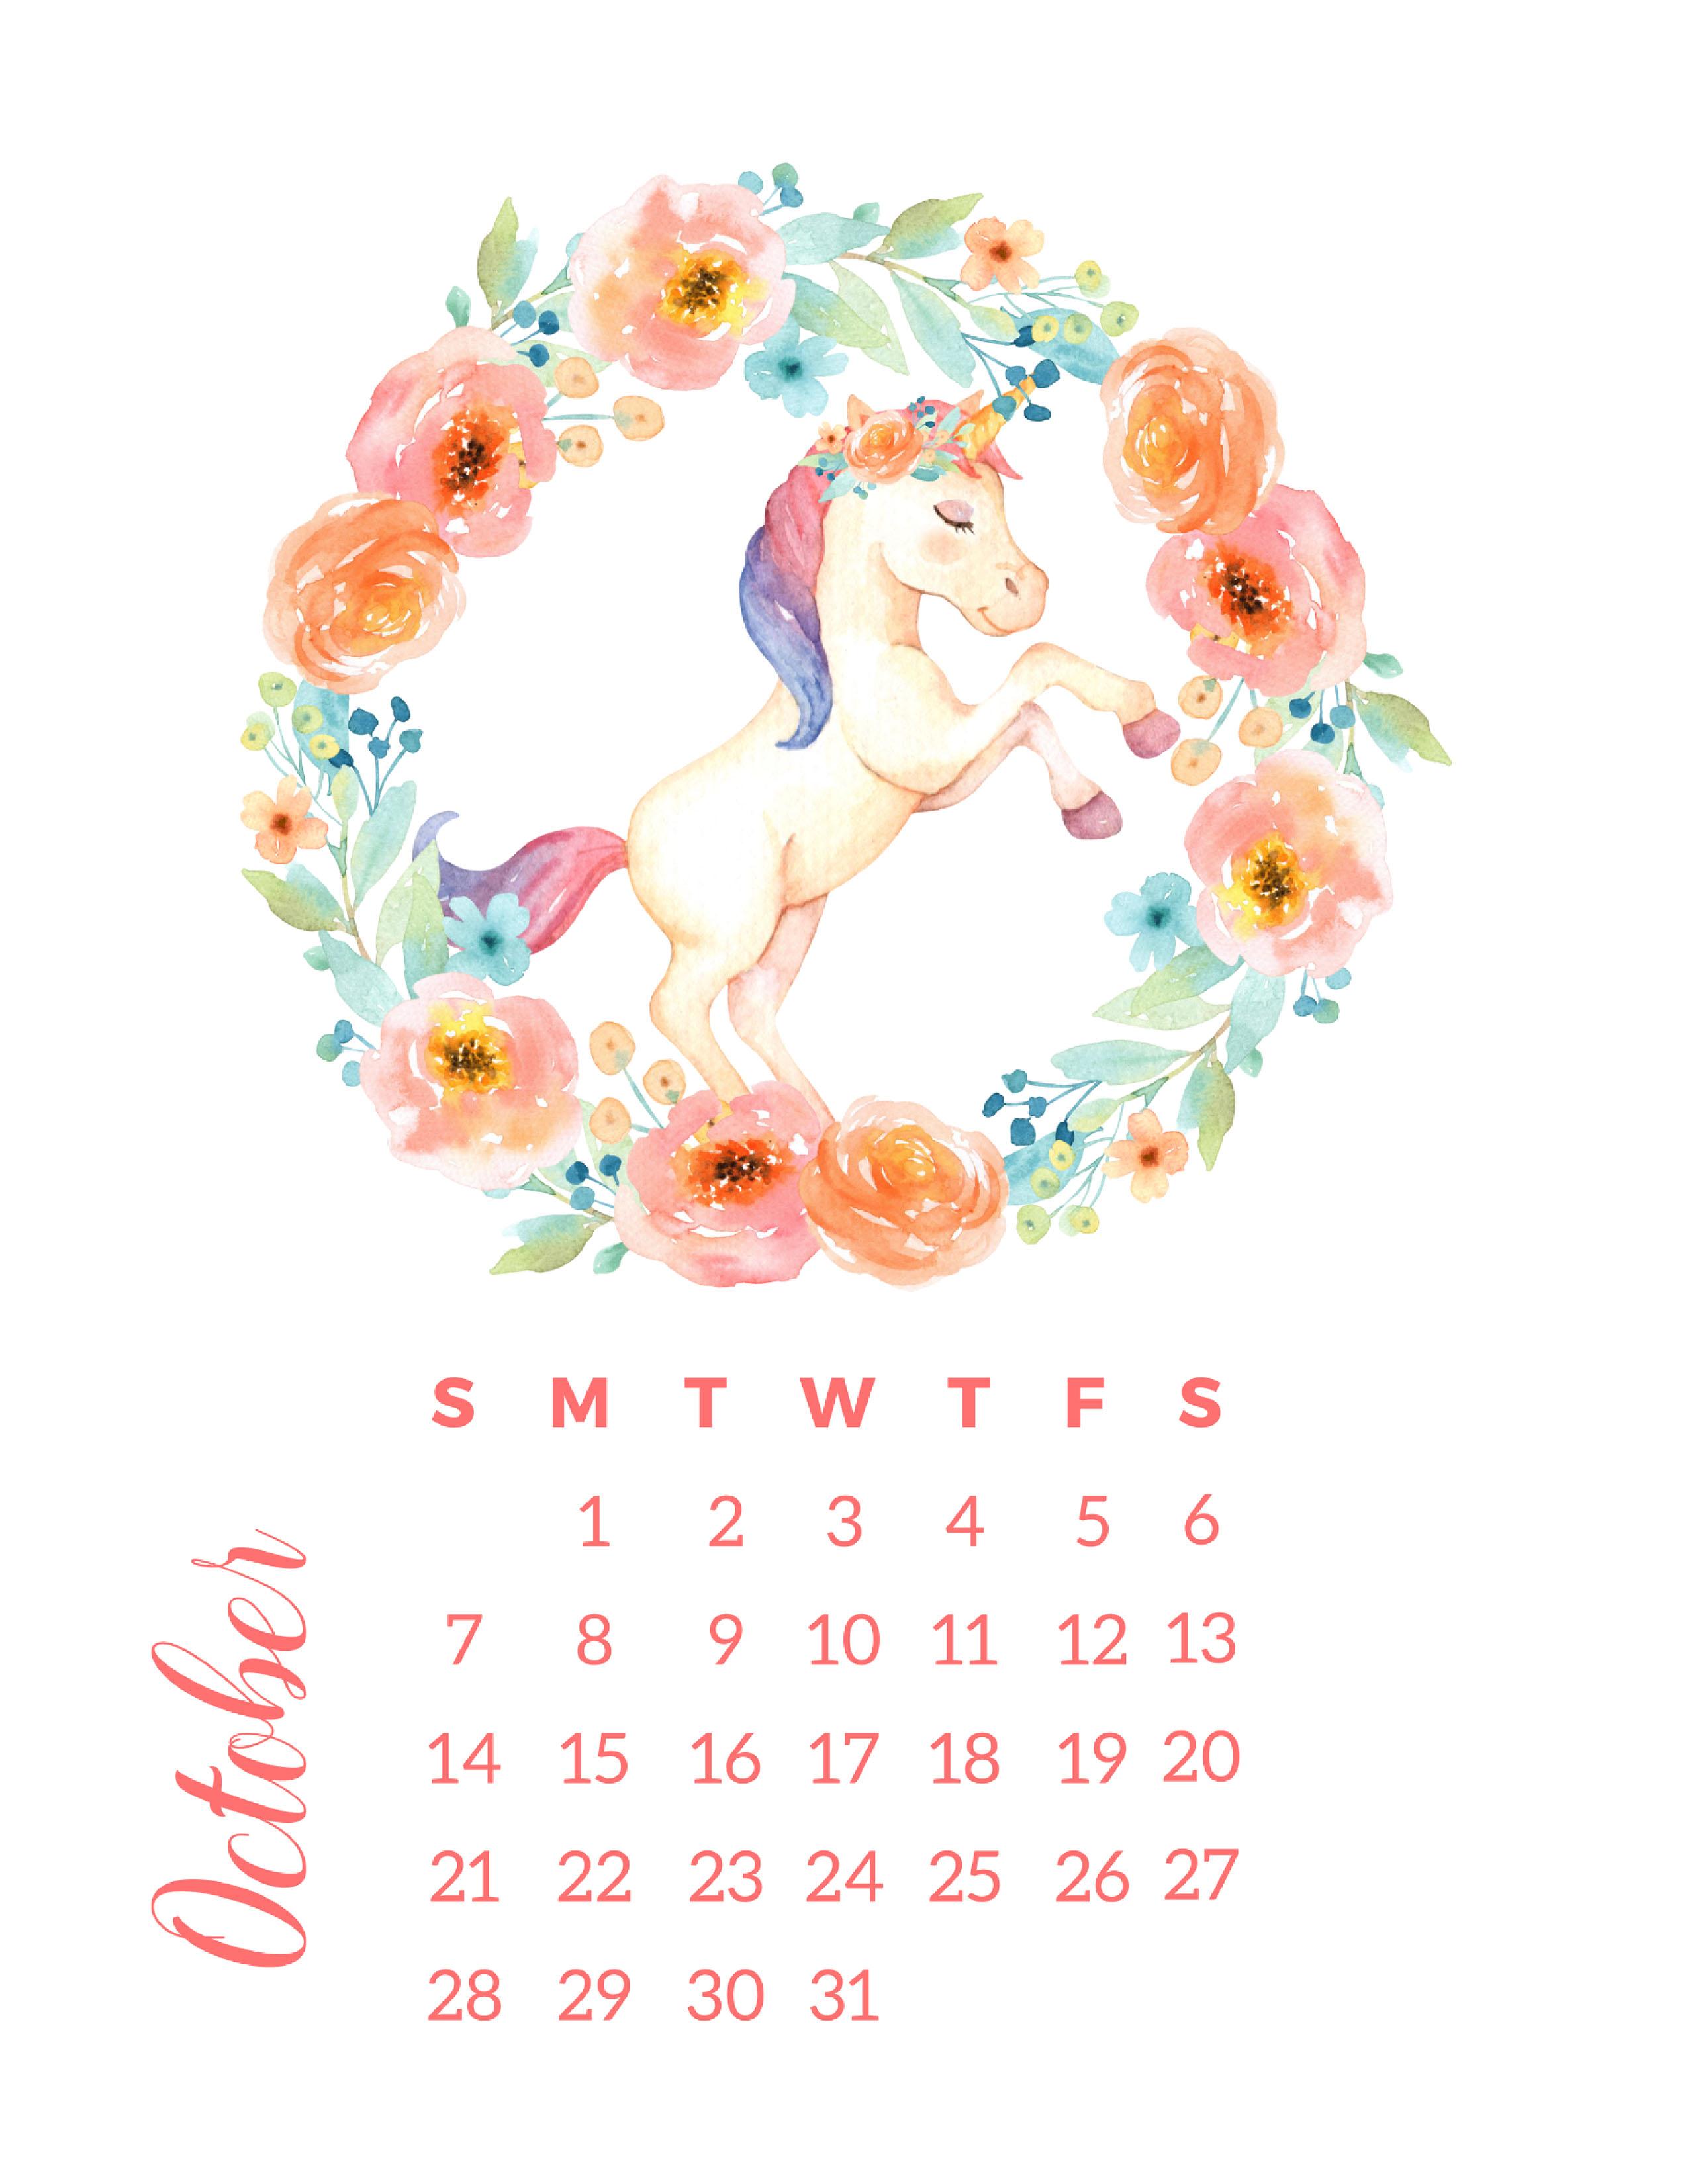 Free Printable 2018 Watercolor Unicorn Calendar - The ...